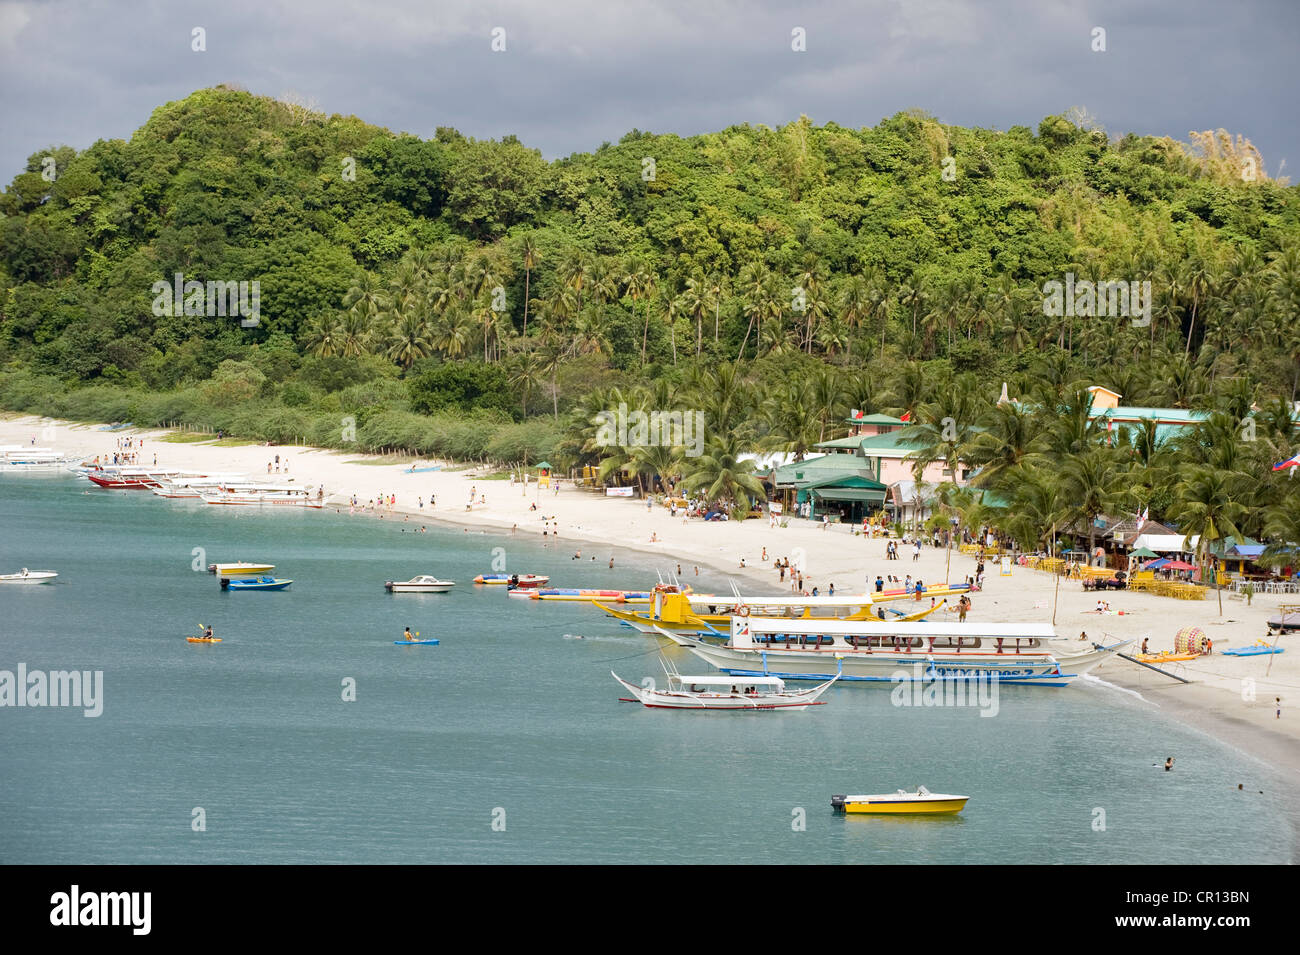 Philippines Mindoro Island Sea Resort Of Puerto Galera